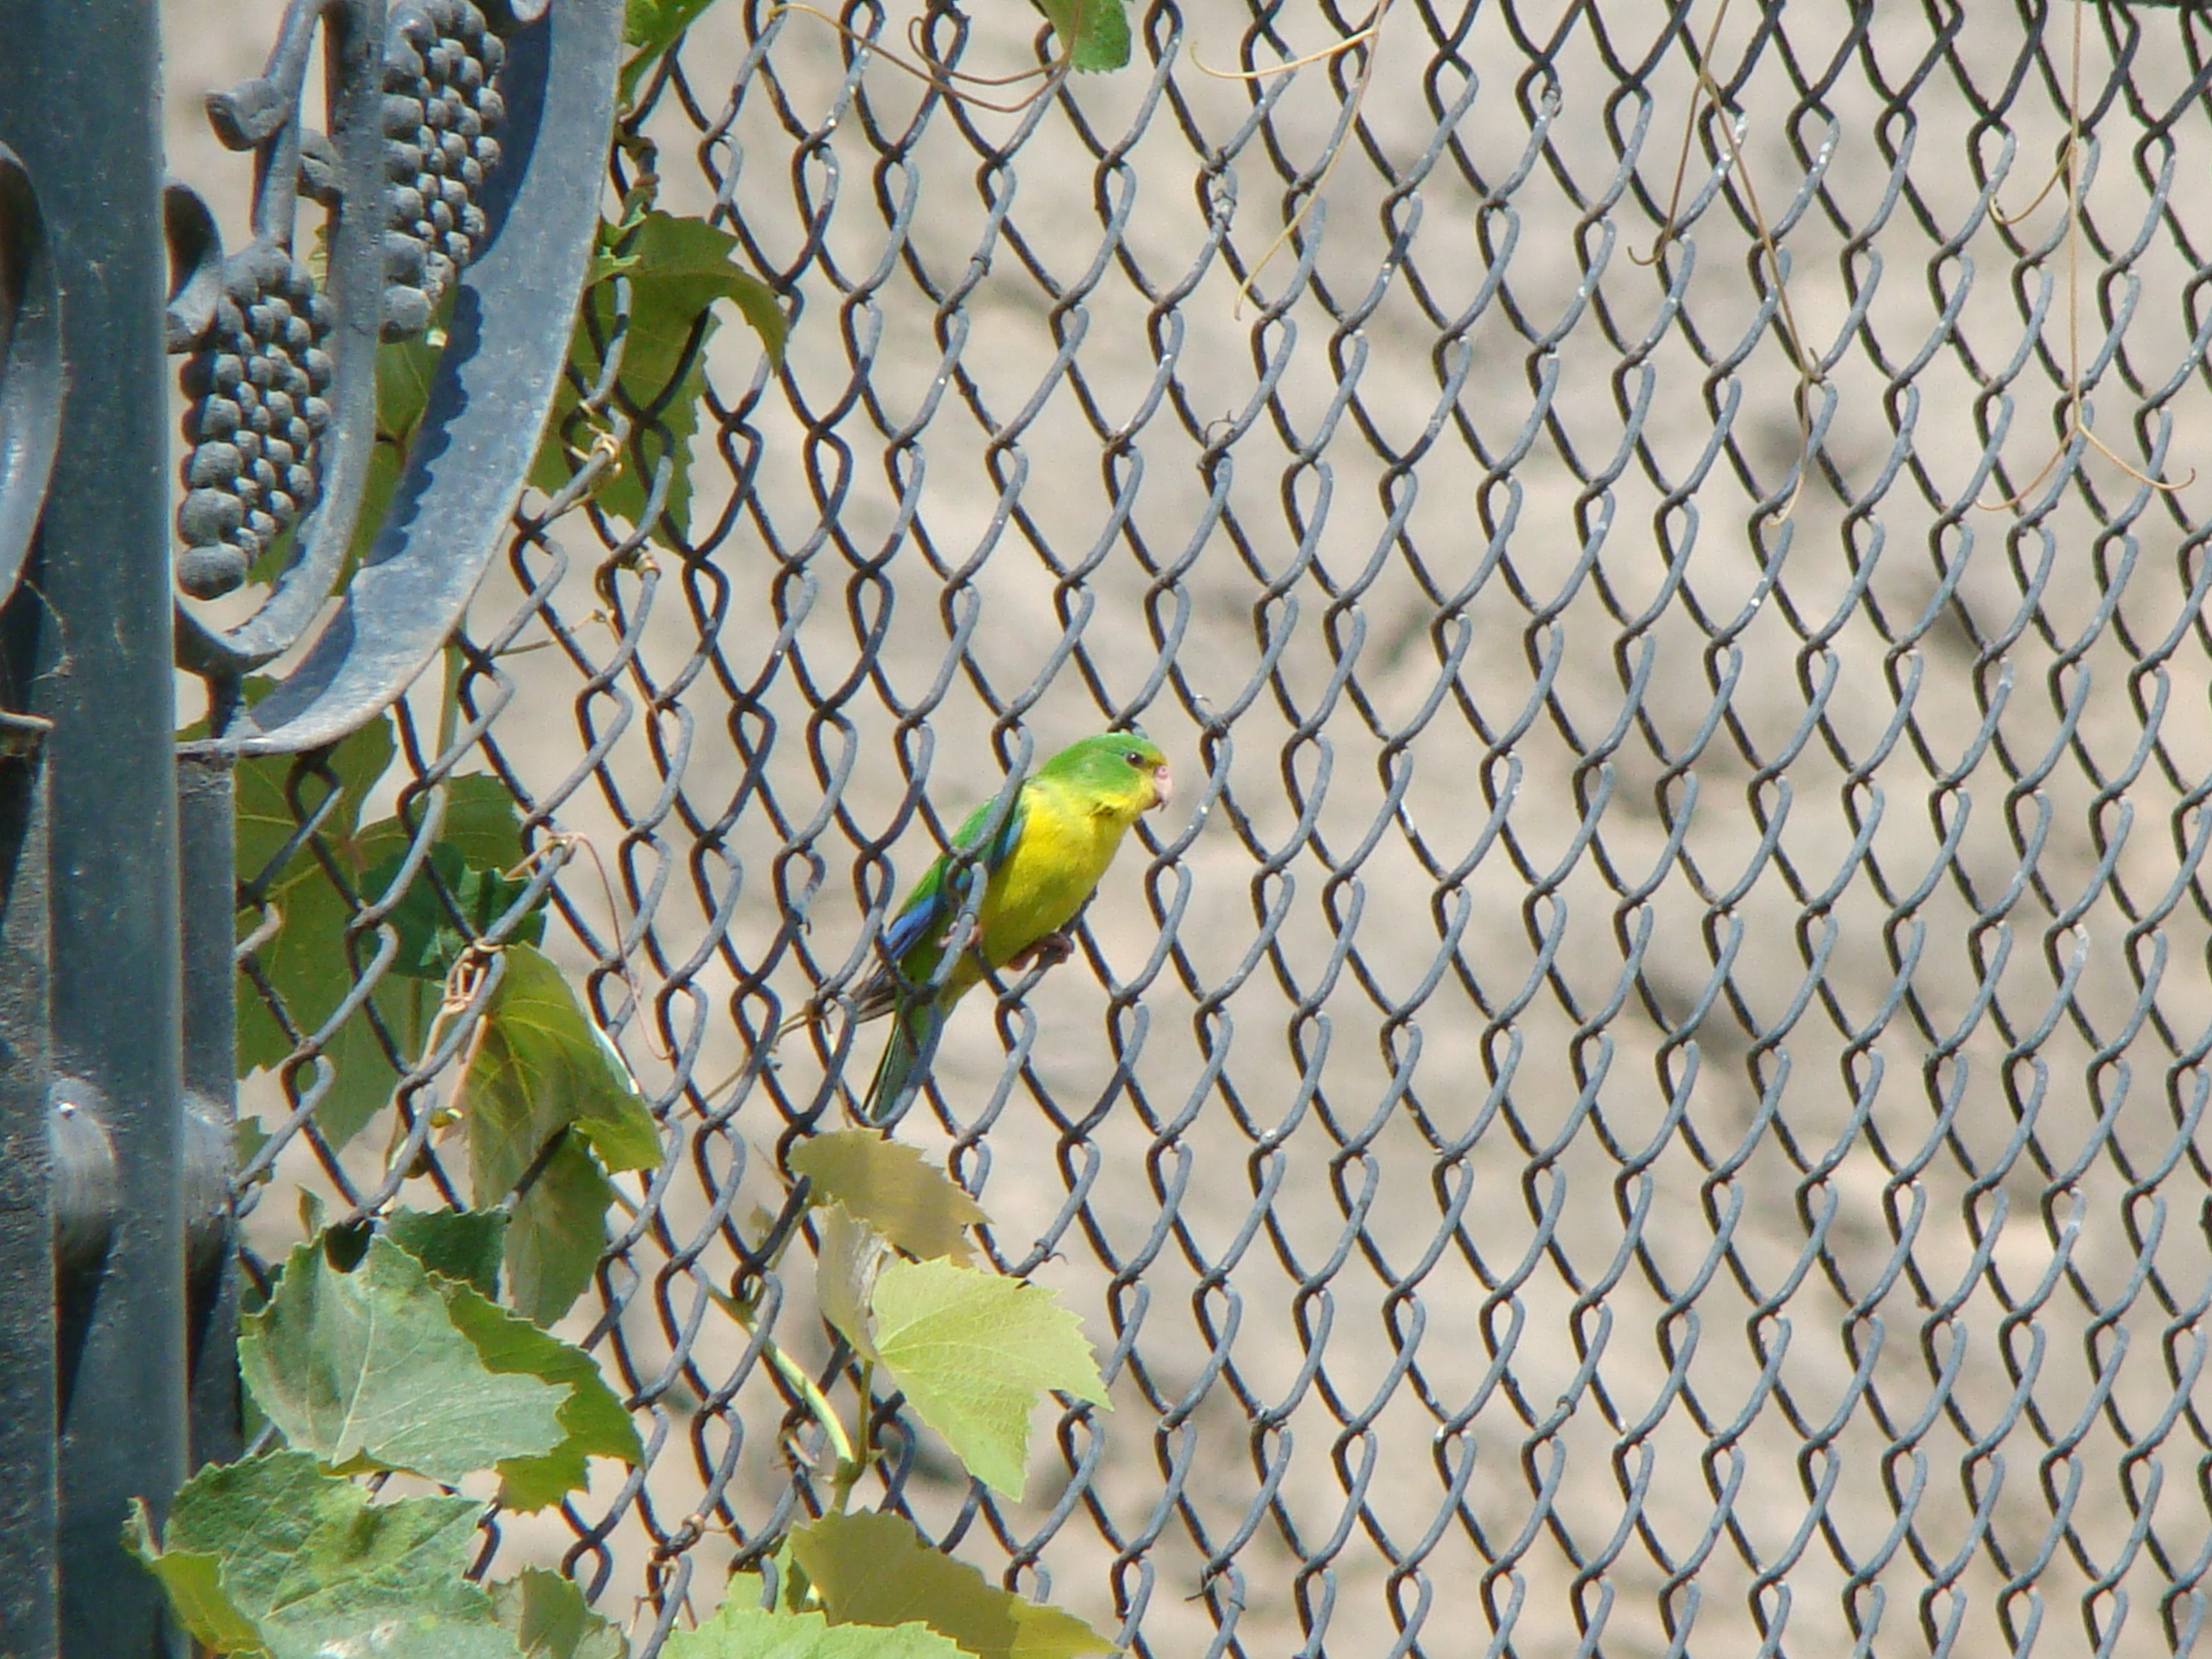 Scientific Name: Andean Parakeet - Photo: Rodrigo de Piérola